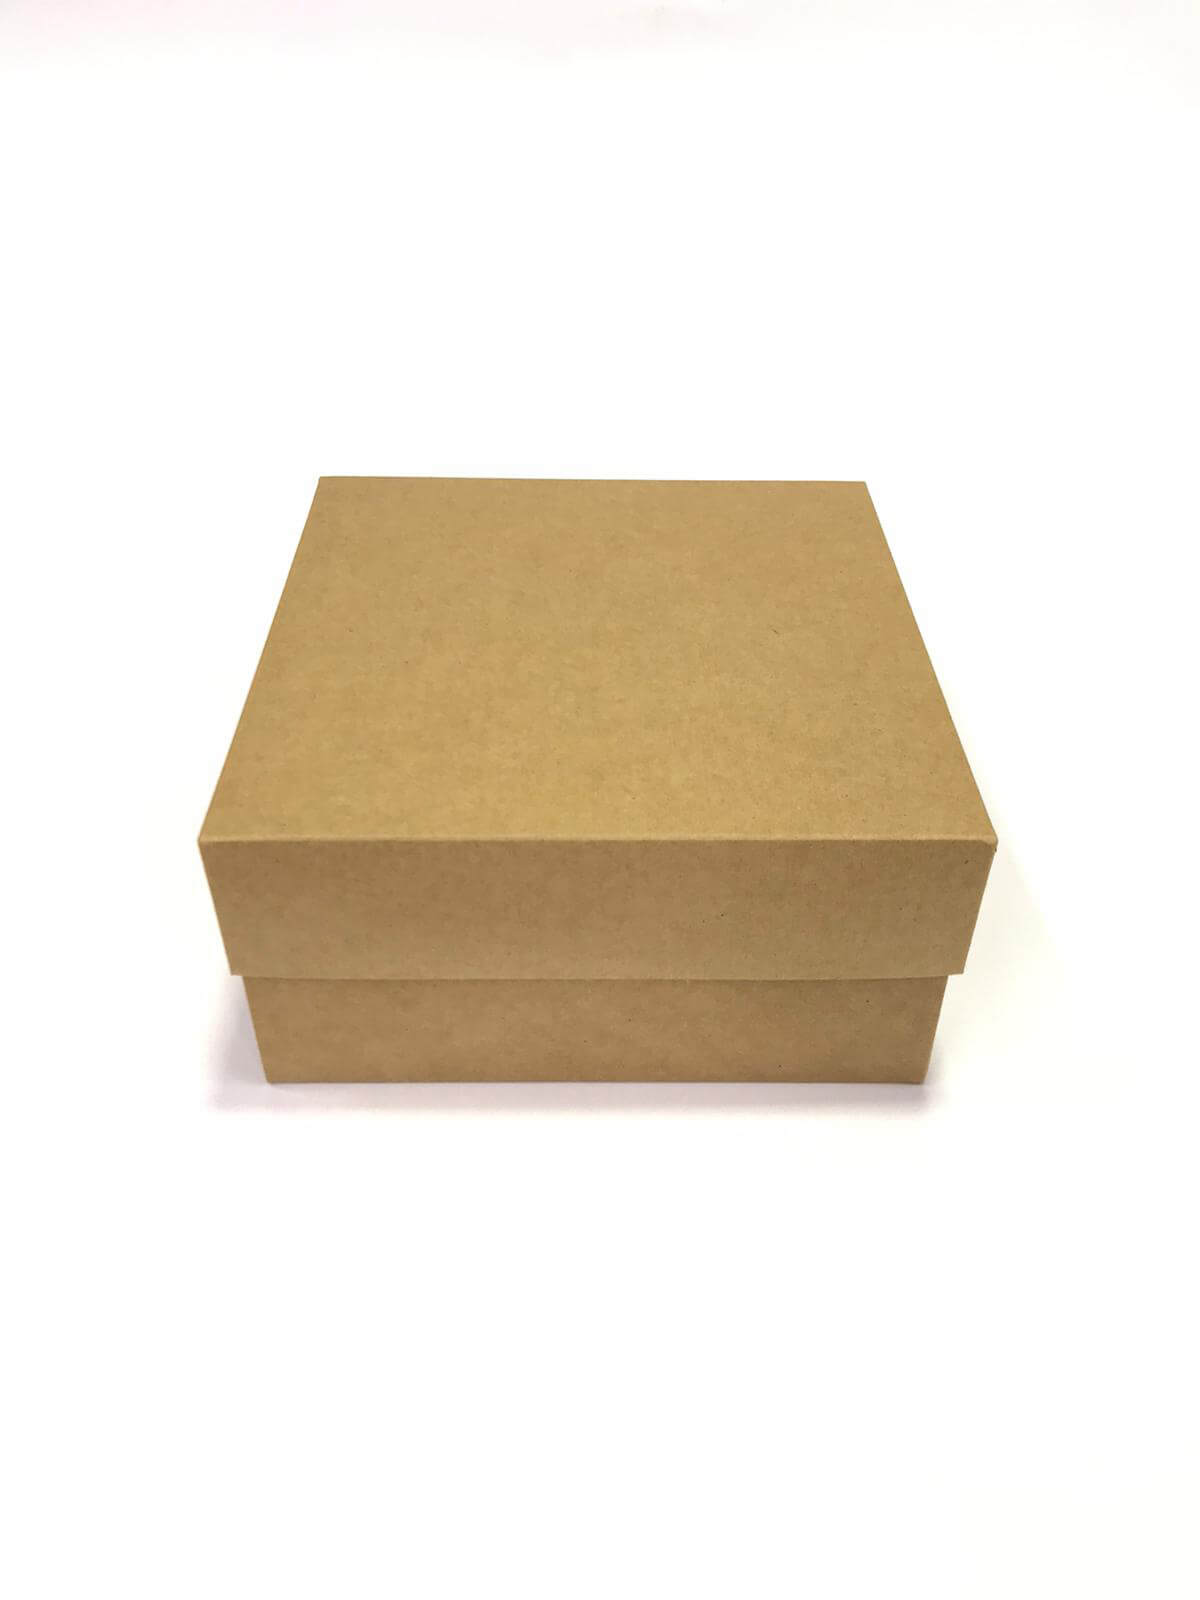 25x25x10 Kraft kutu kapak - 10 Adet fiyatıdır